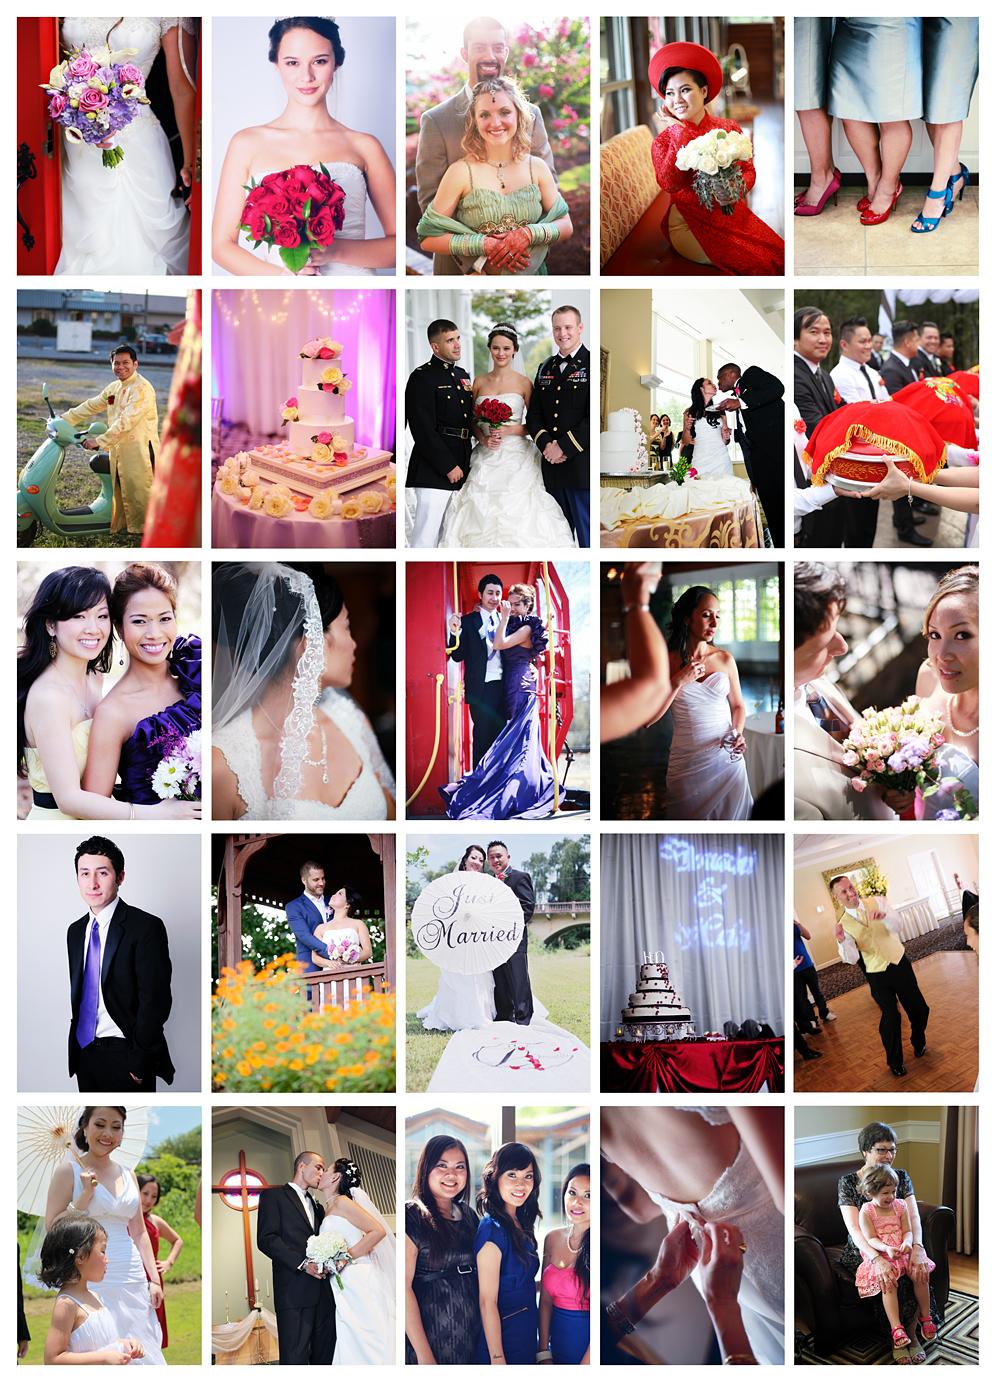 bv_wedding_01